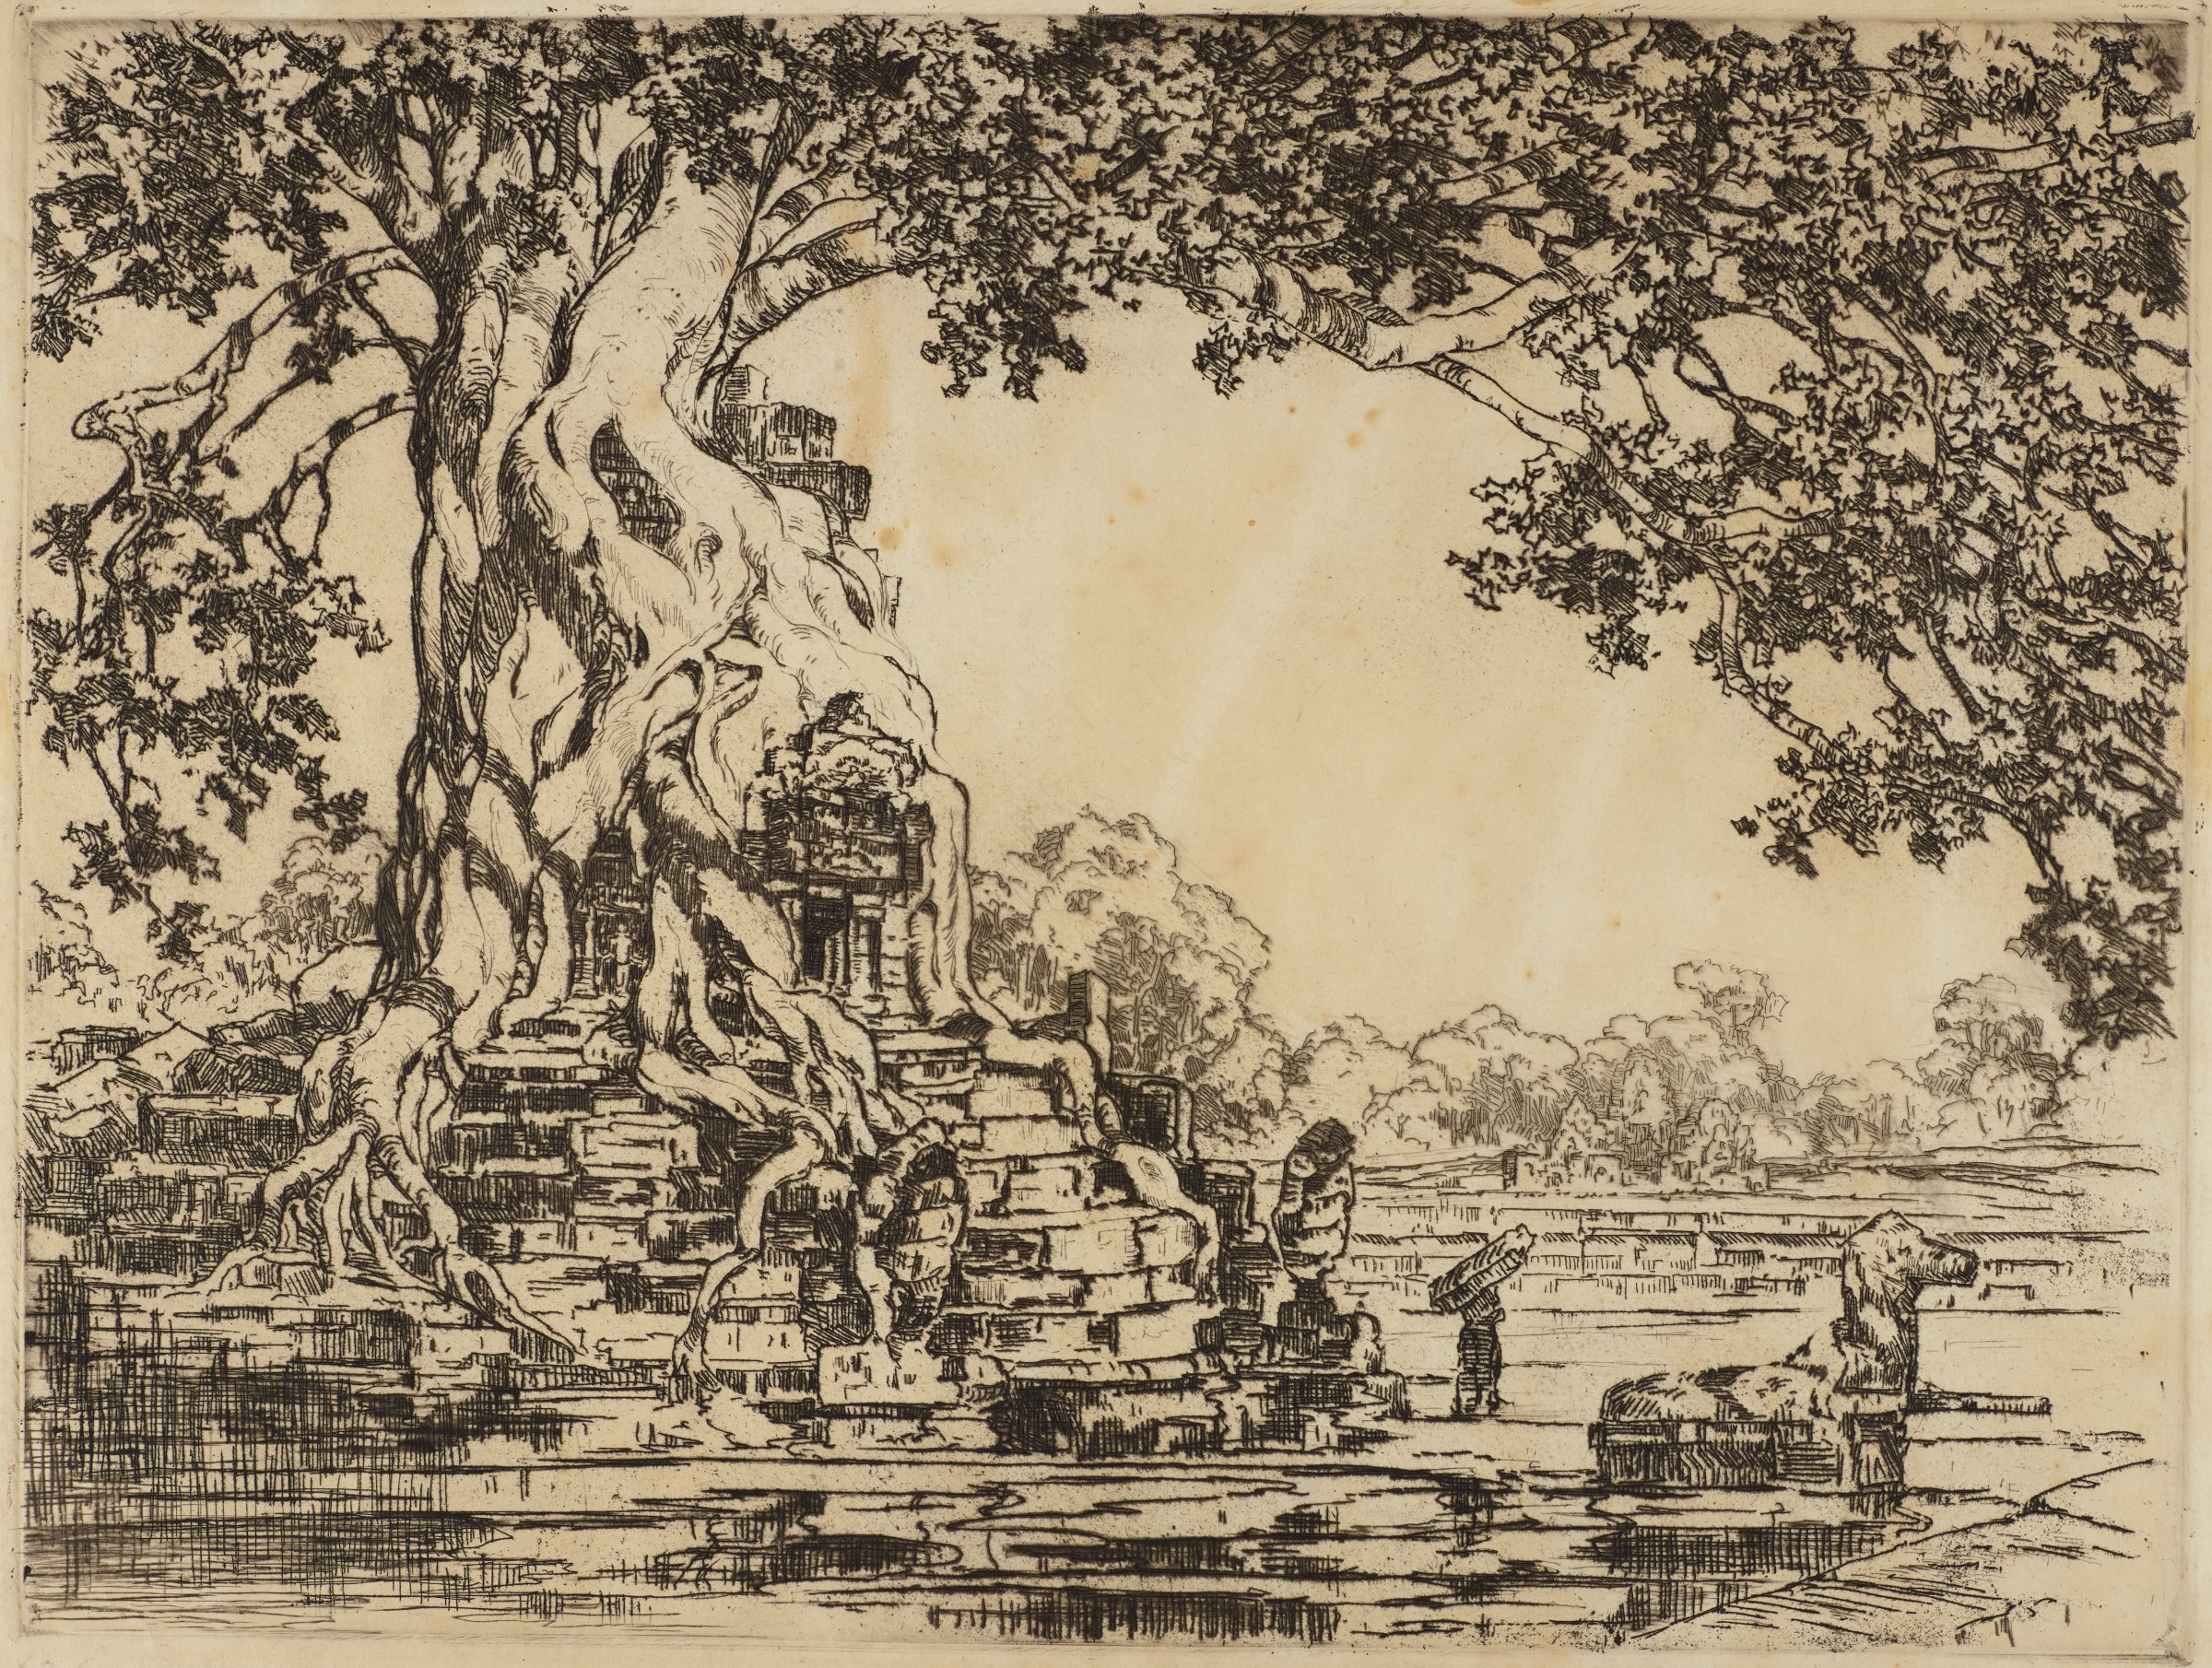 Neak Pean, Cambodia, Lucille Douglass, etching